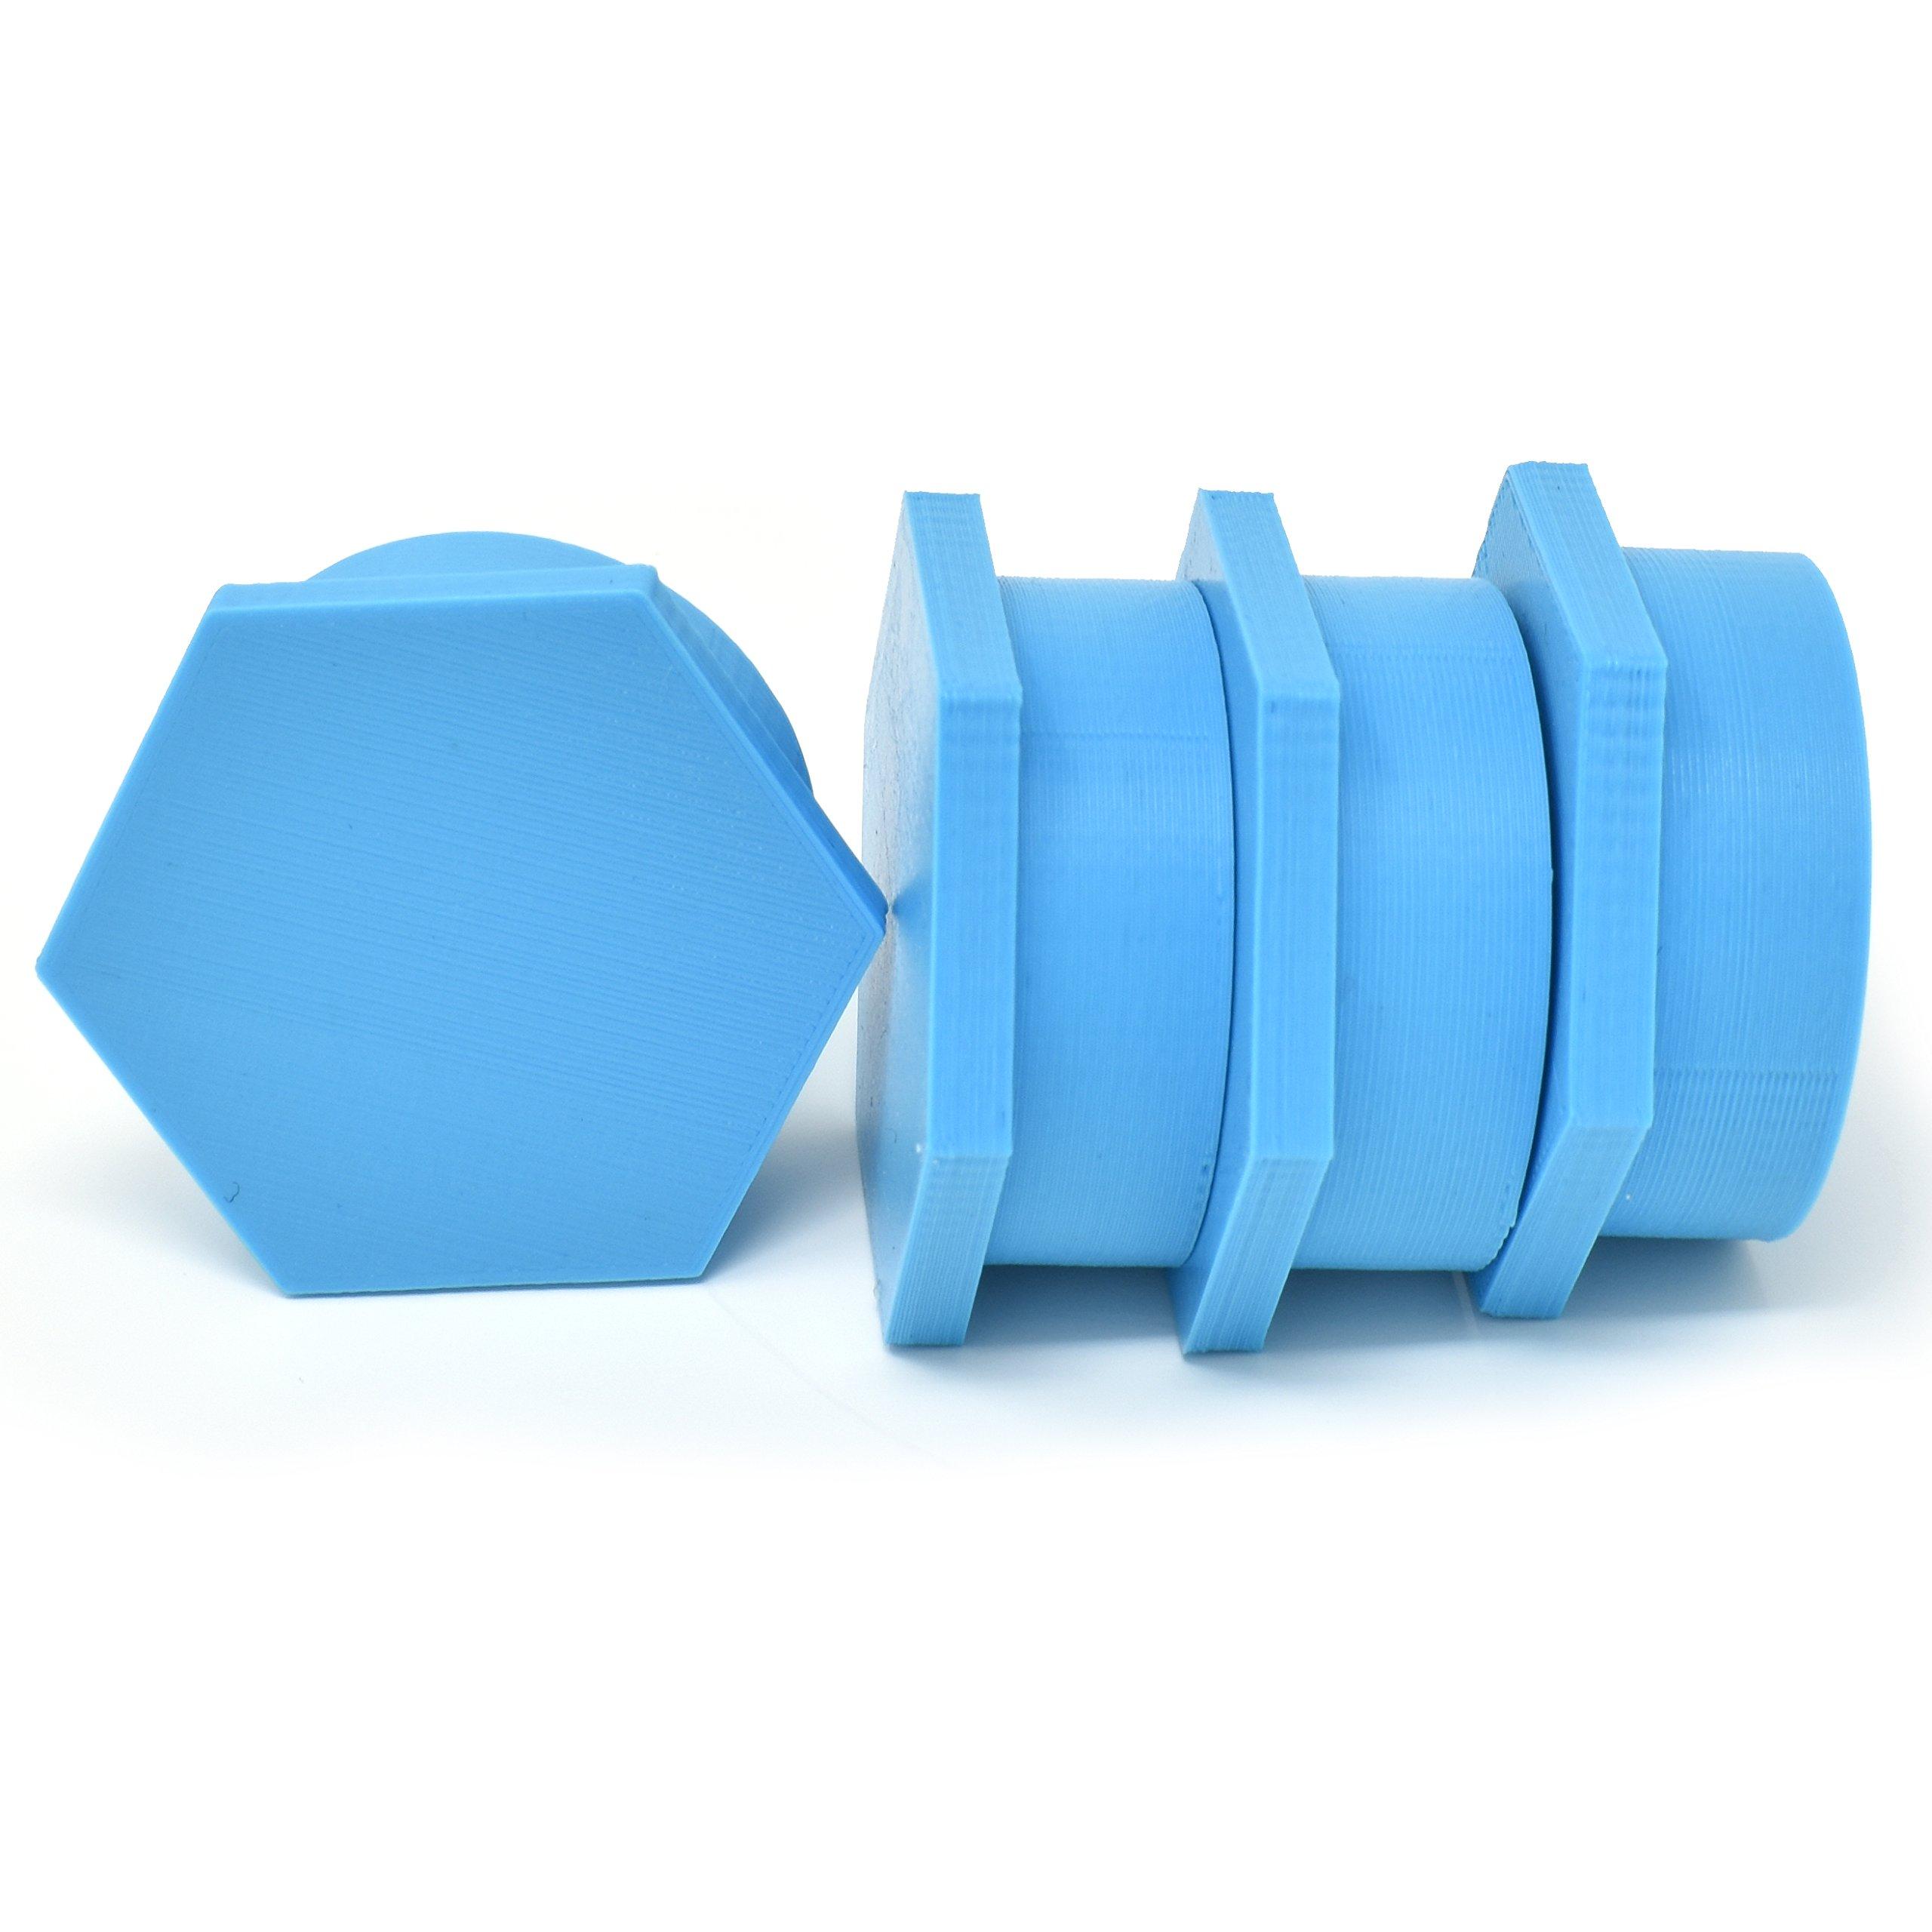 SAMURAI PIPE BOWL COVERS (BLUE)